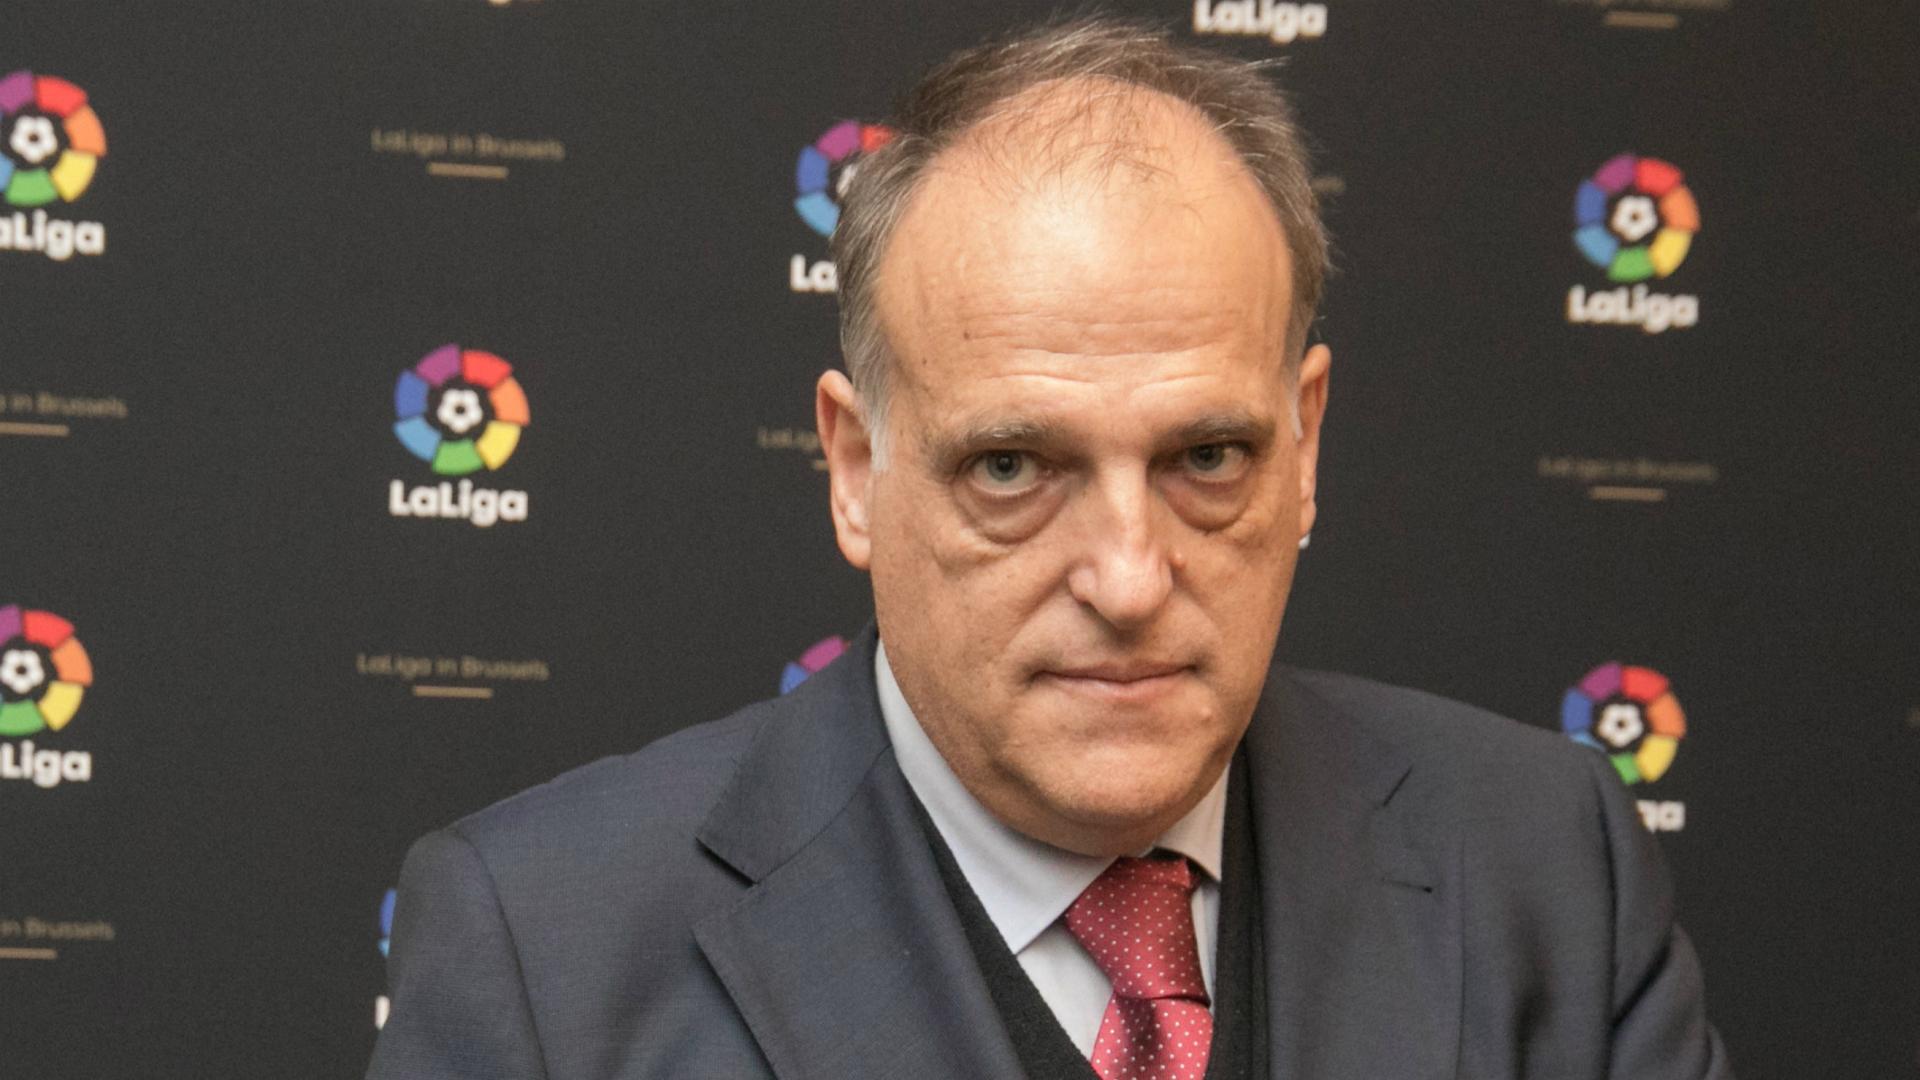 Coronavirus: LaLiga chief Tebas threatens obligatory training camps if players flout medical protocols